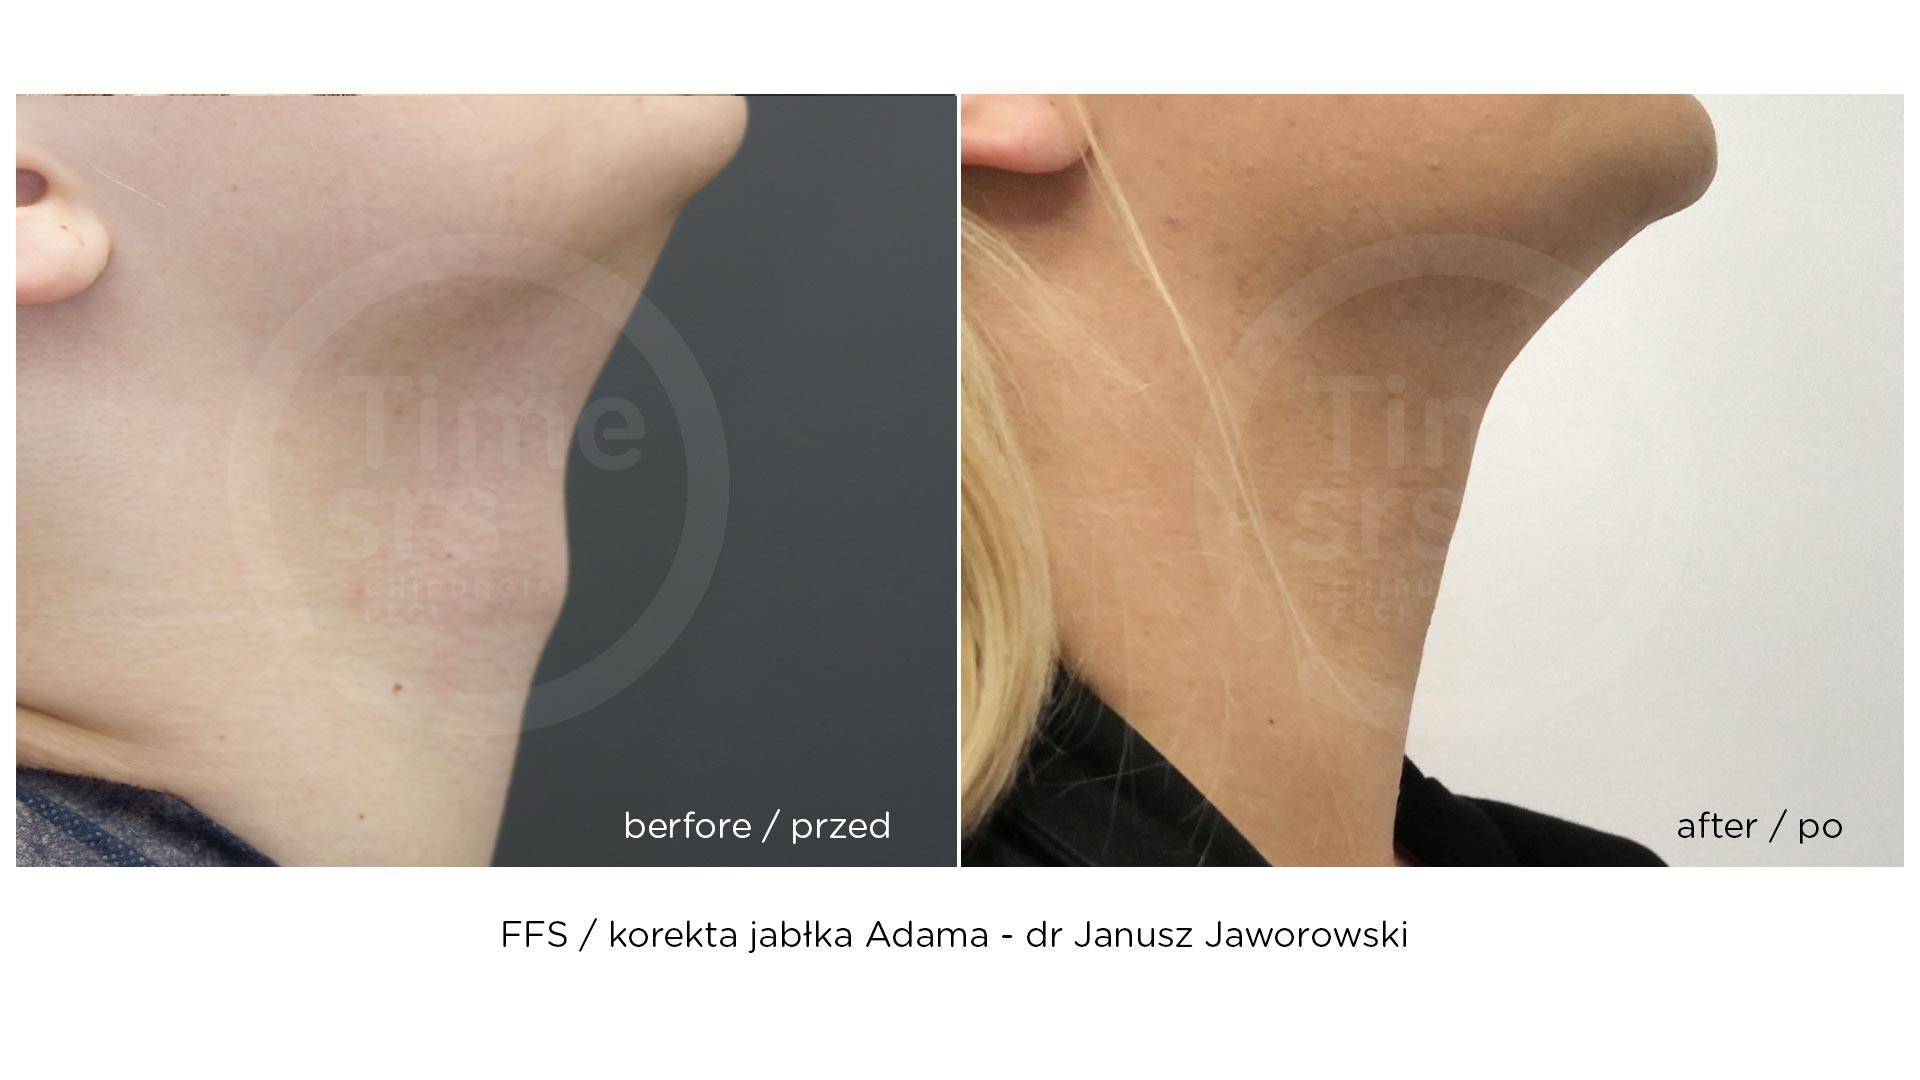 FFS-przed-po-chirurgiaplci-jablko-adama-3